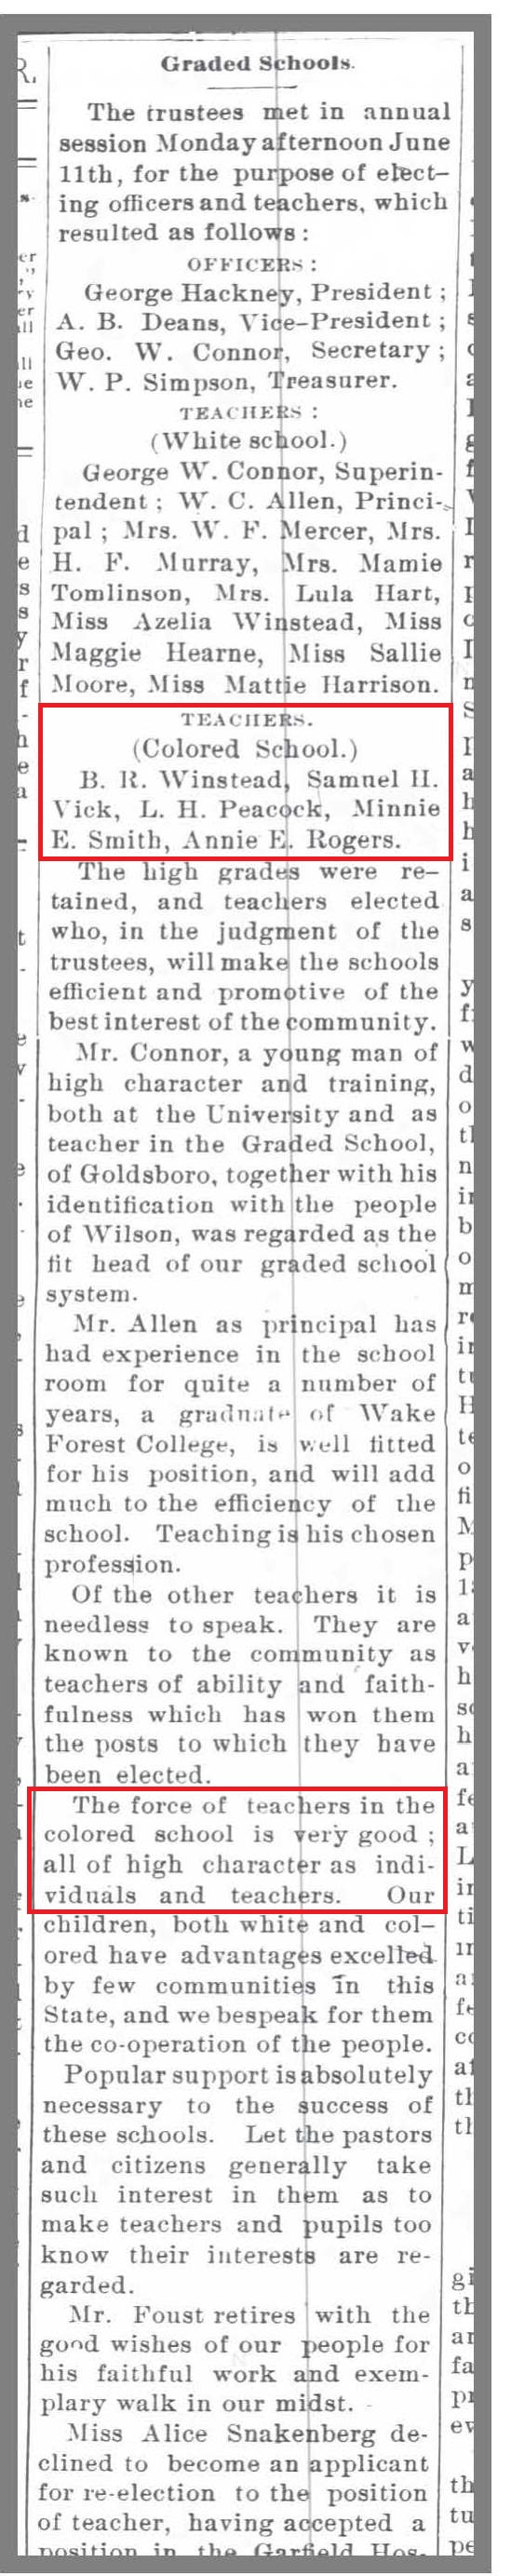 Wilson_Mirror_6_13_1894_graded_school